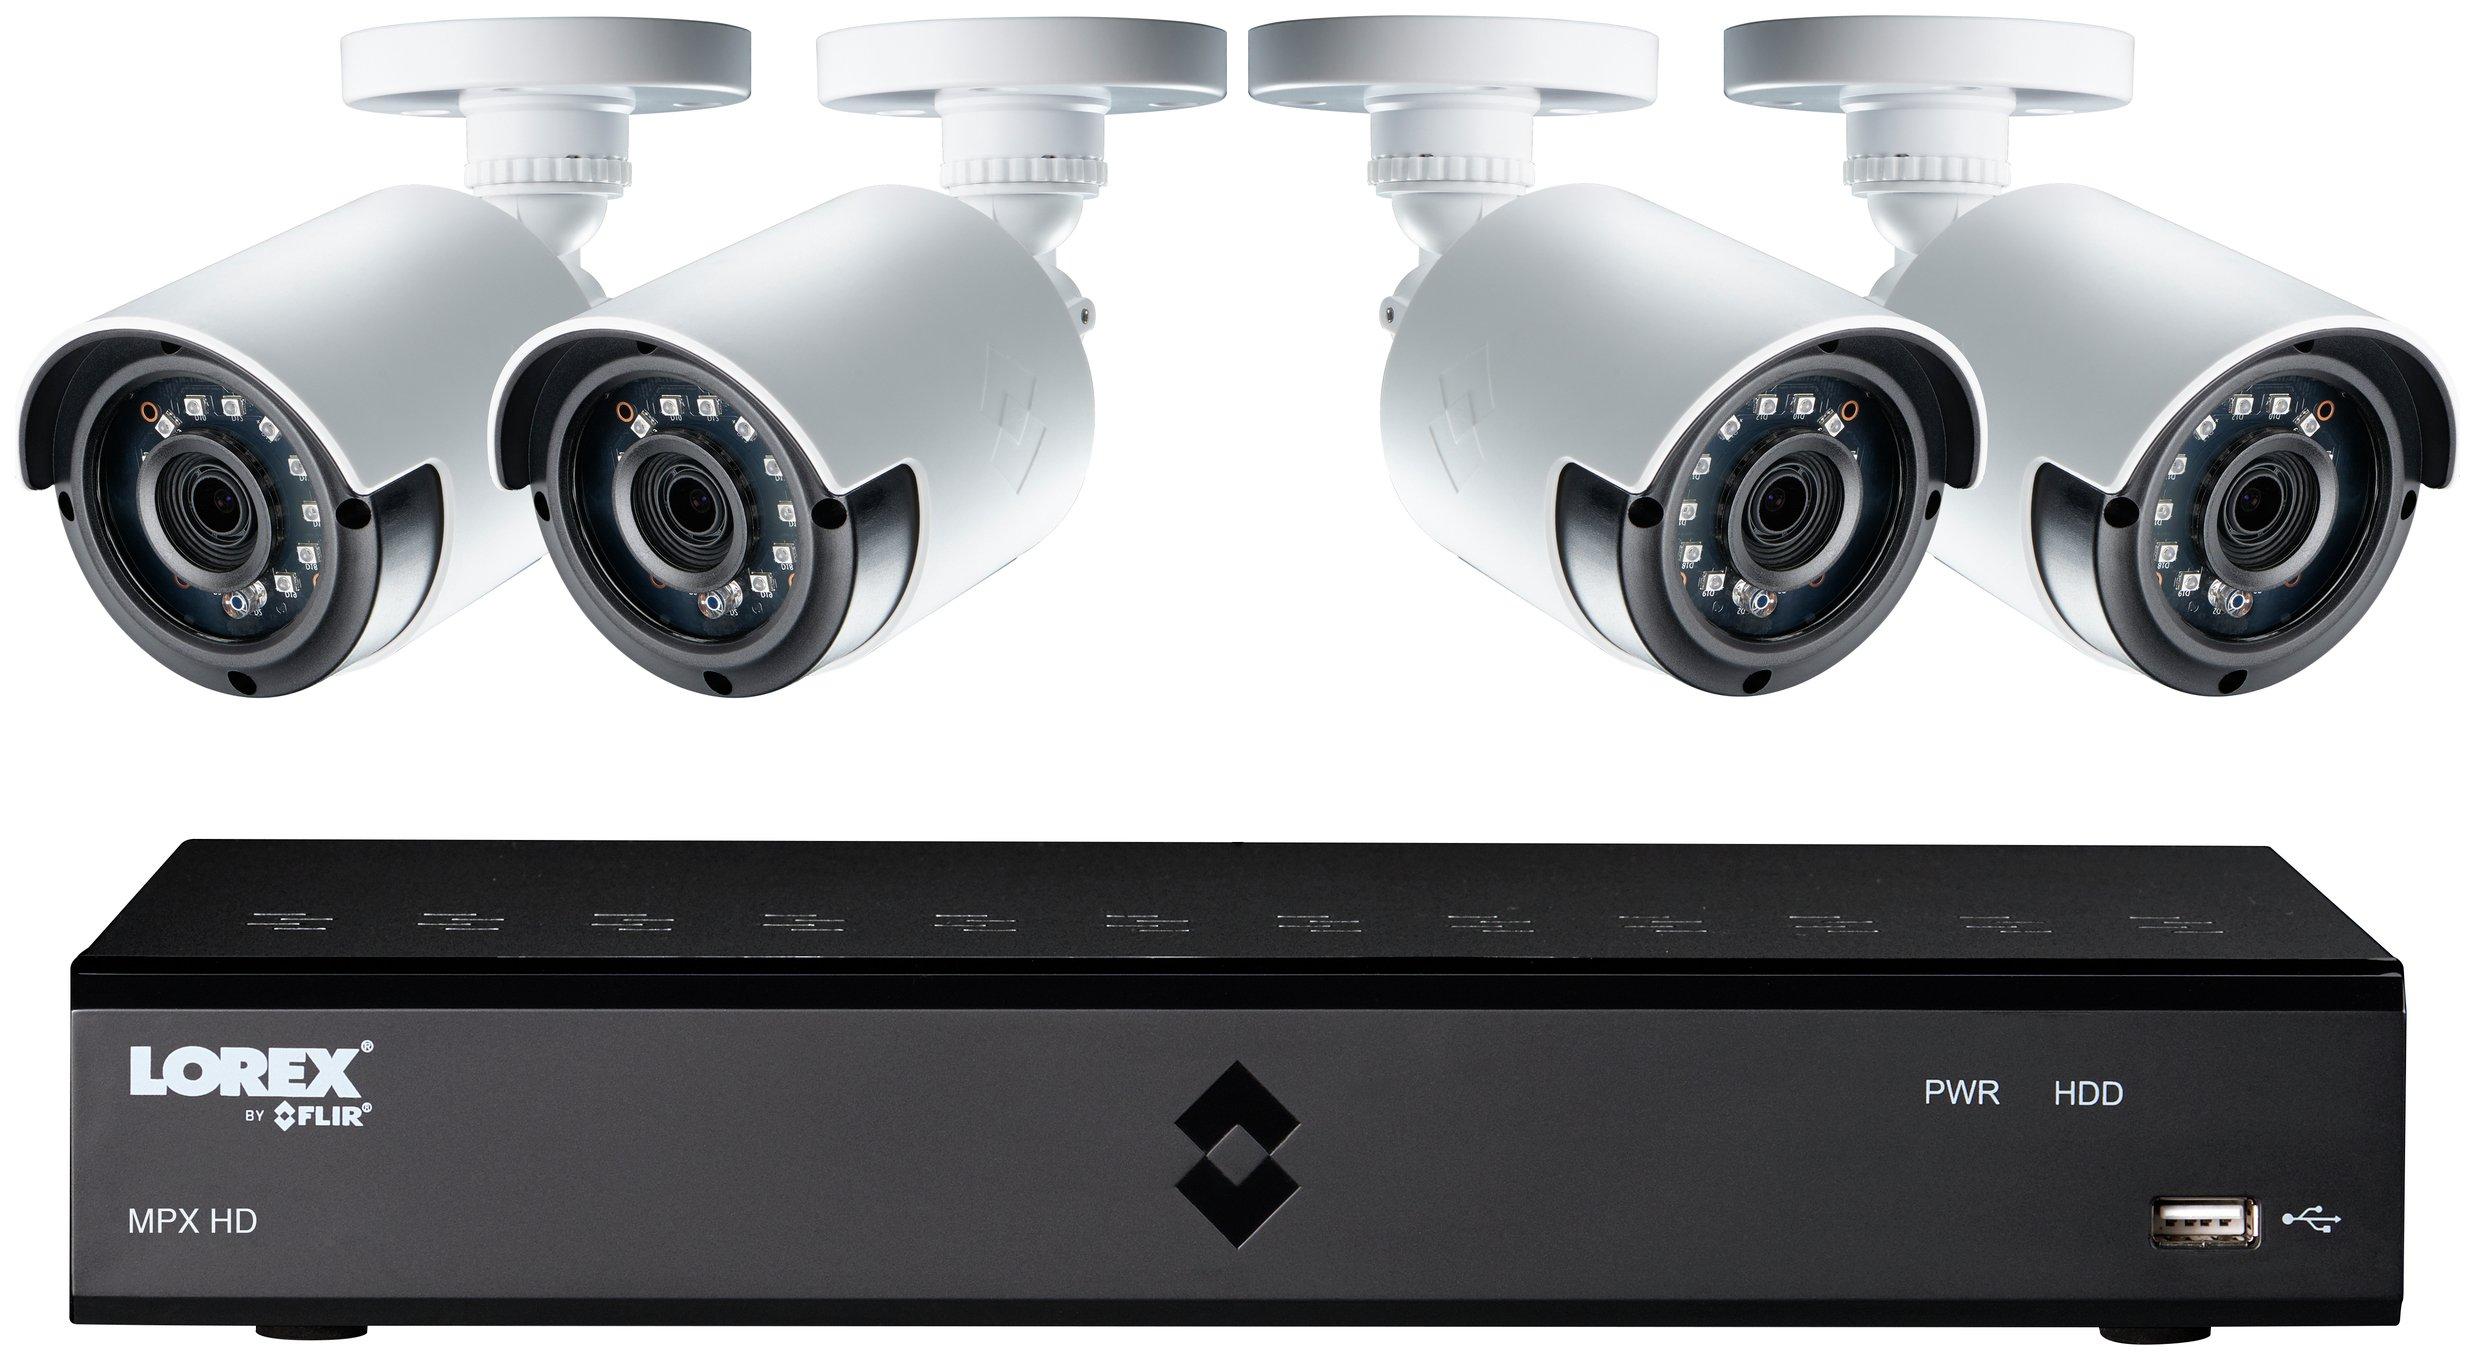 Lorex 4 Channel 1080p DVR with 4 x HD Cameras